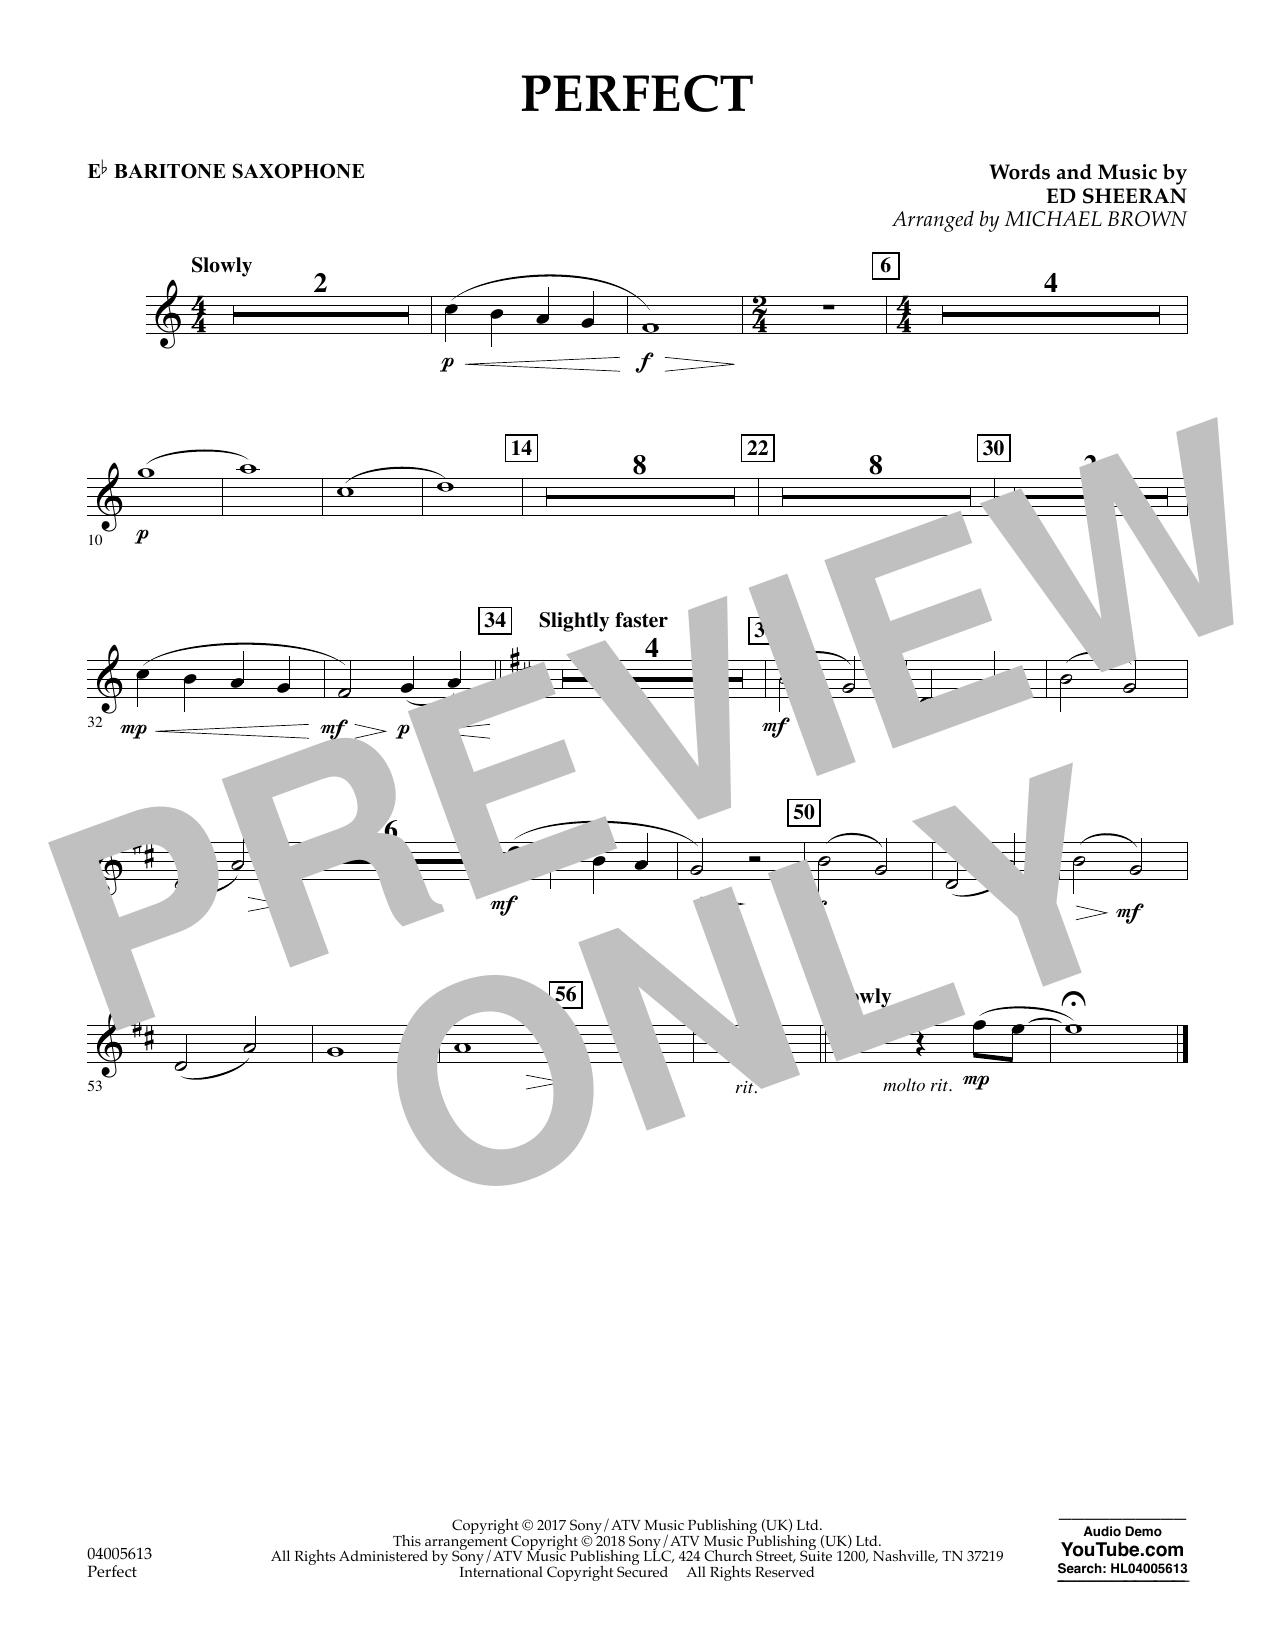 Perfect (arr. Michael Brown) - Eb Baritone Saxophone (Concert Band)